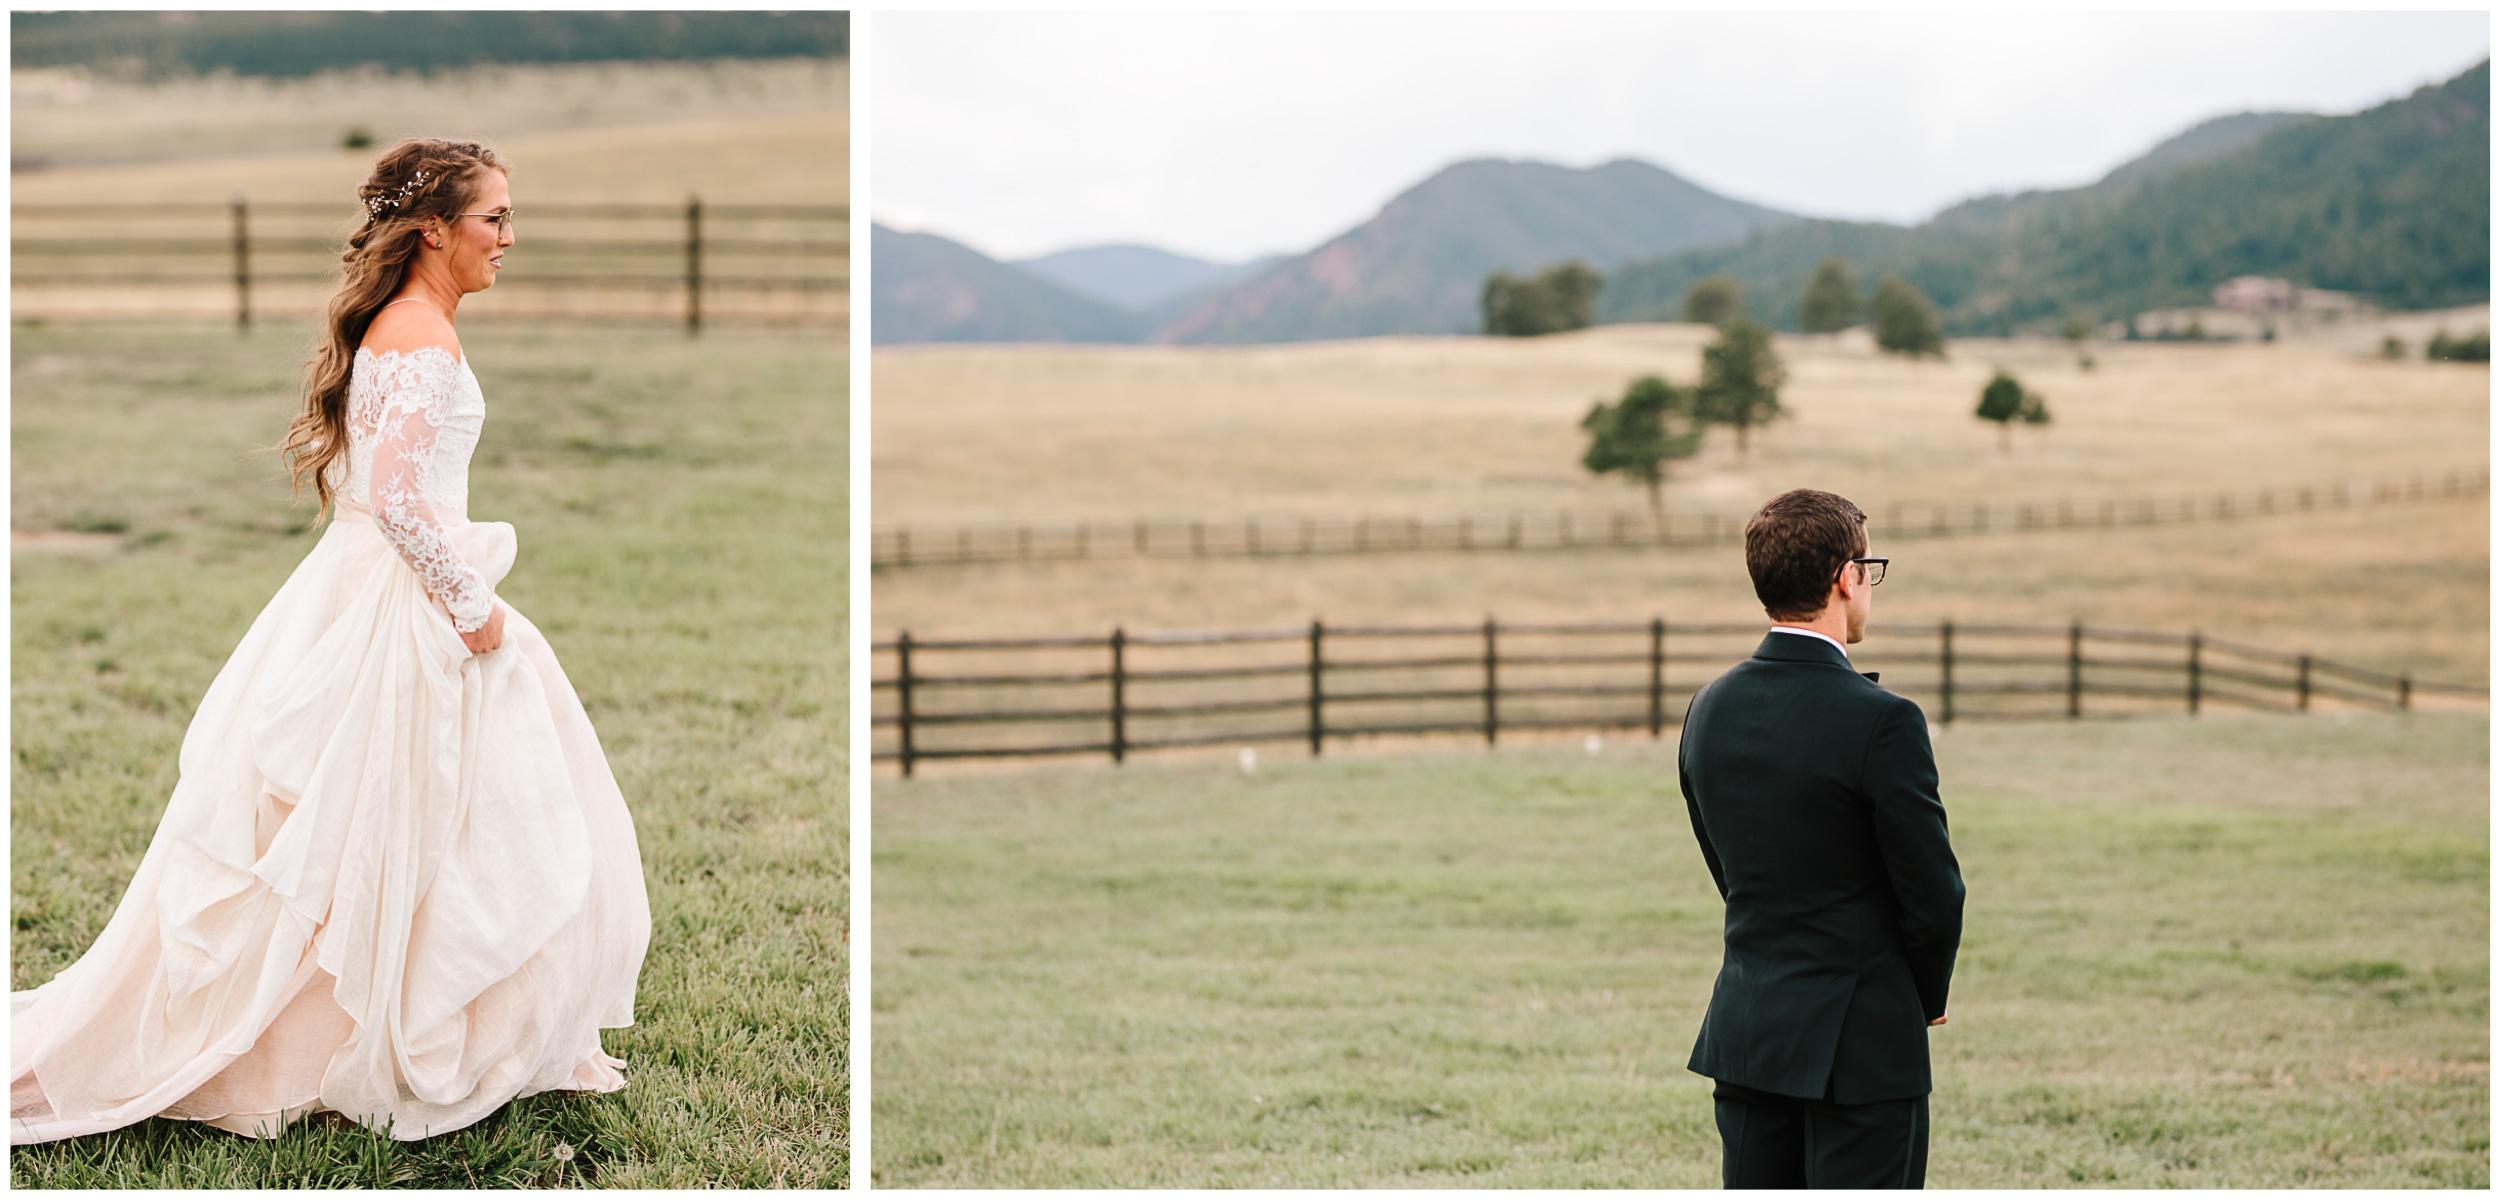 spruce_mountain_ranch_wedding_20.jpg